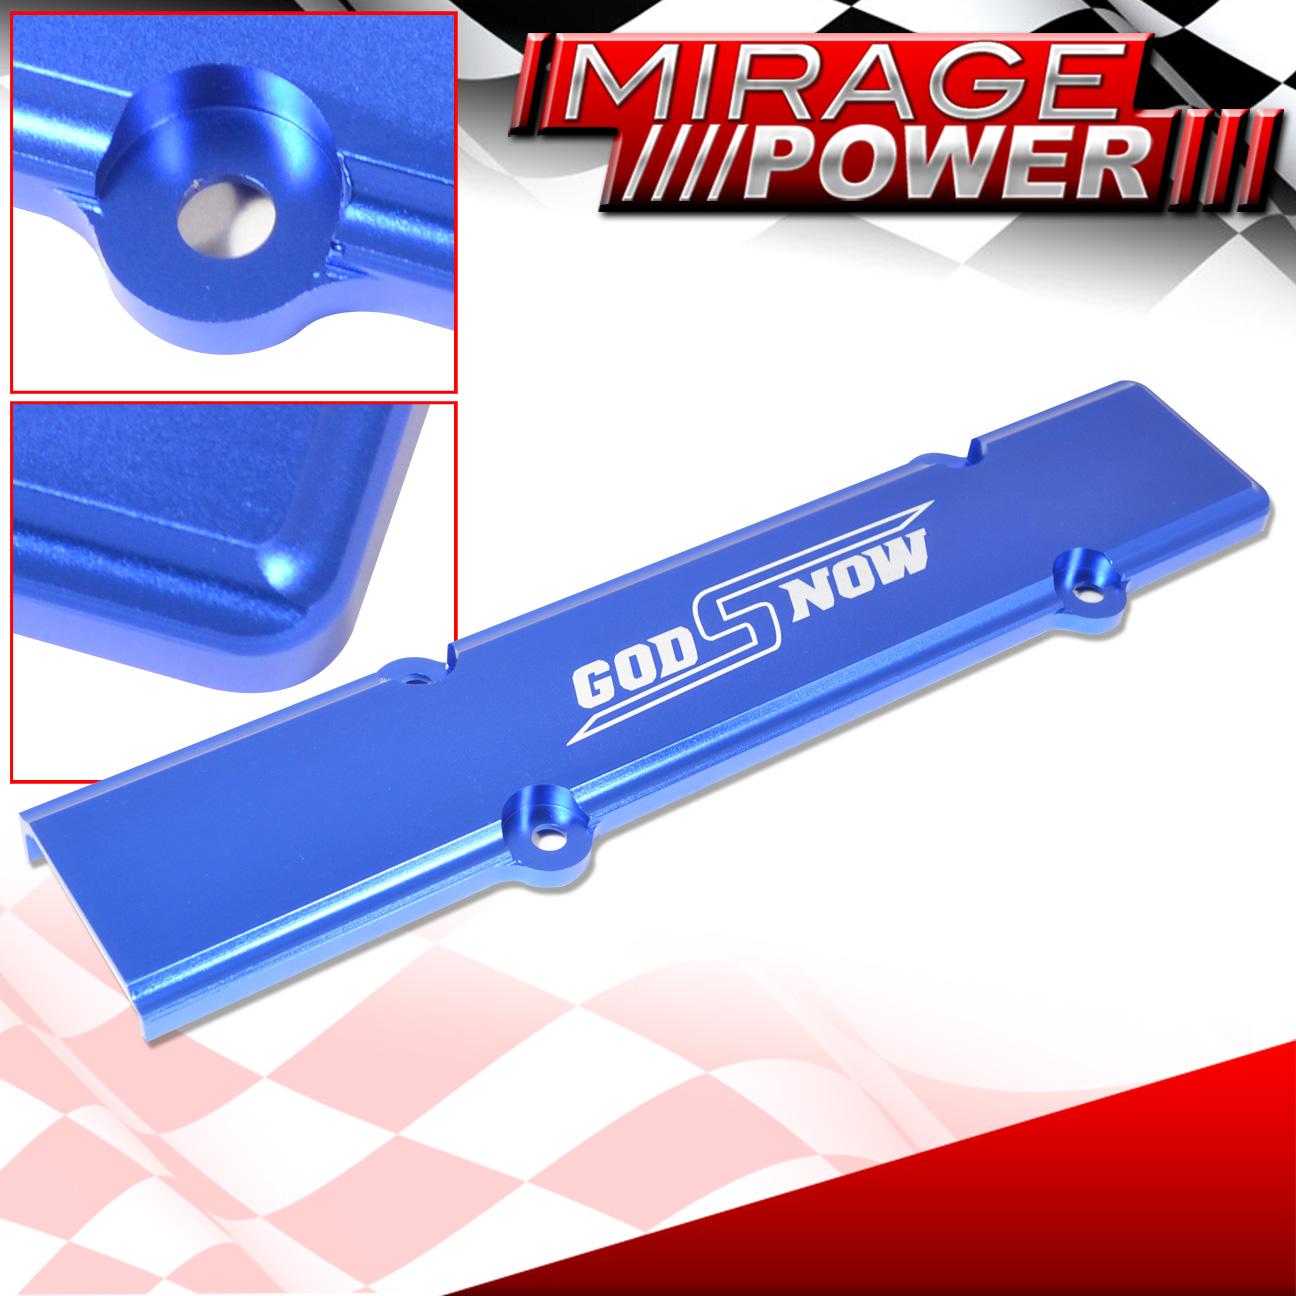 For Acura Integra Honda Civic B-Series Valve Spark Plug